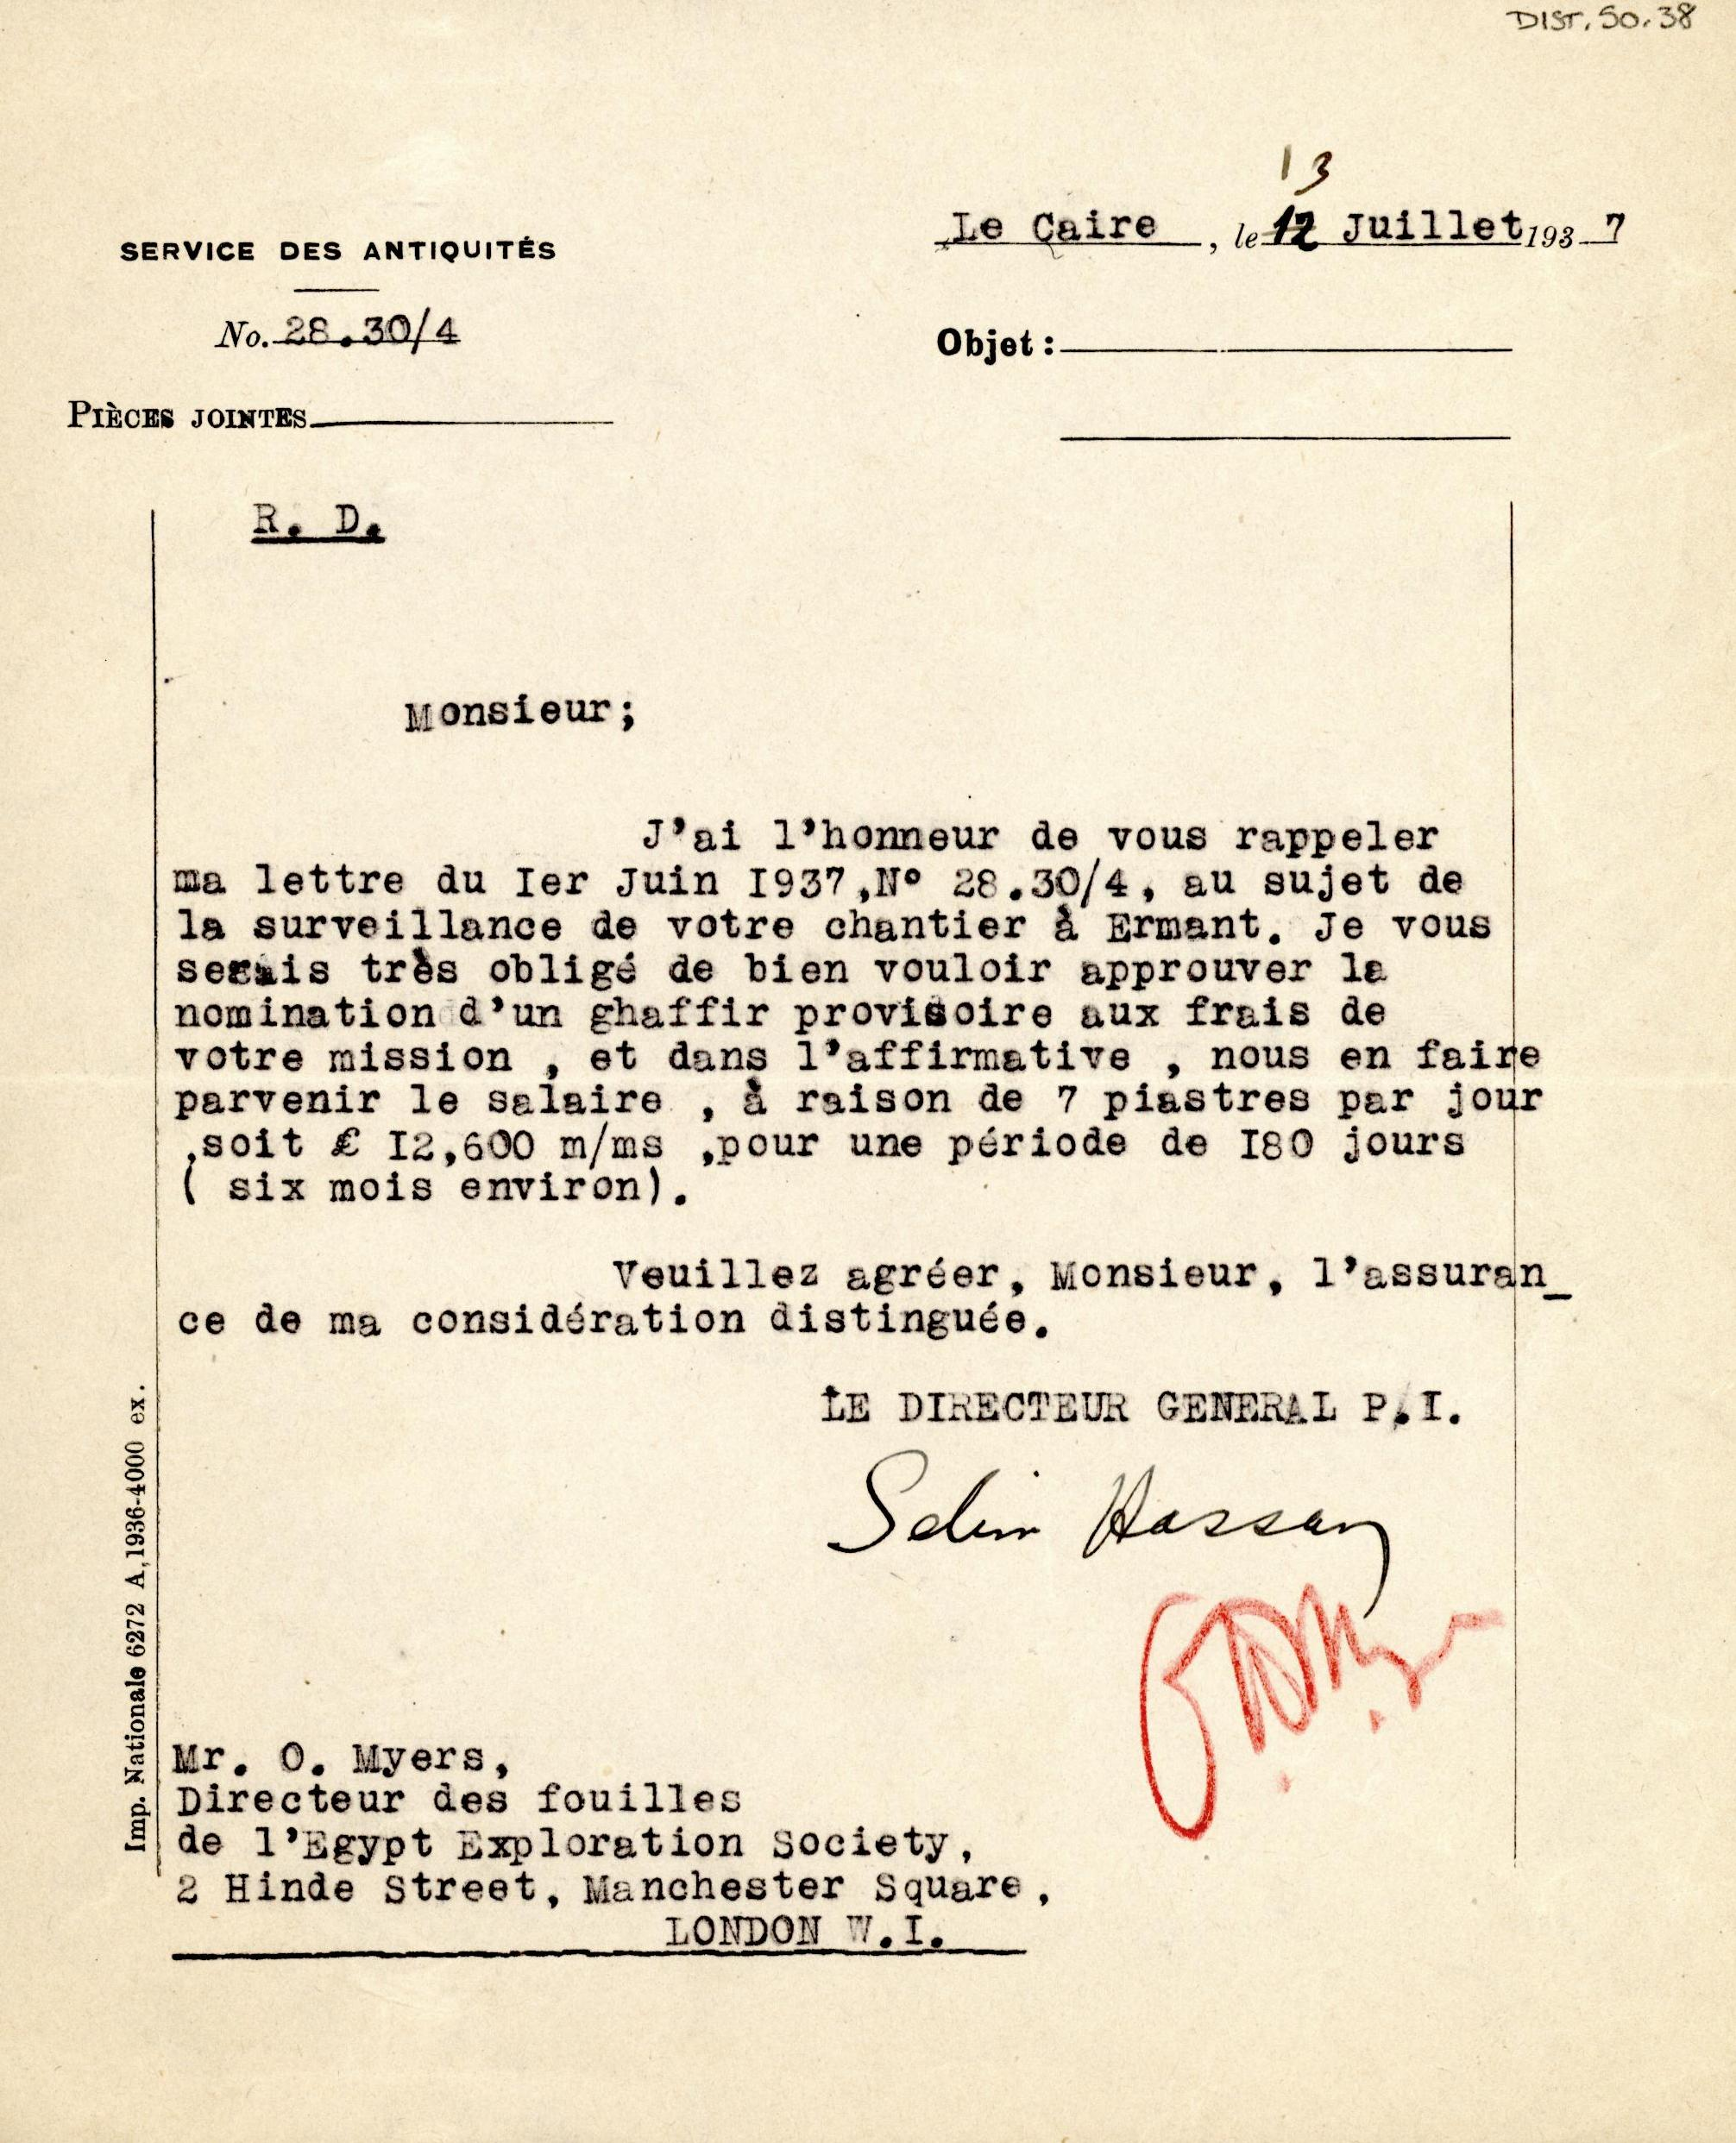 1926-39 correspondence with Antiquities Service DIST.50.38